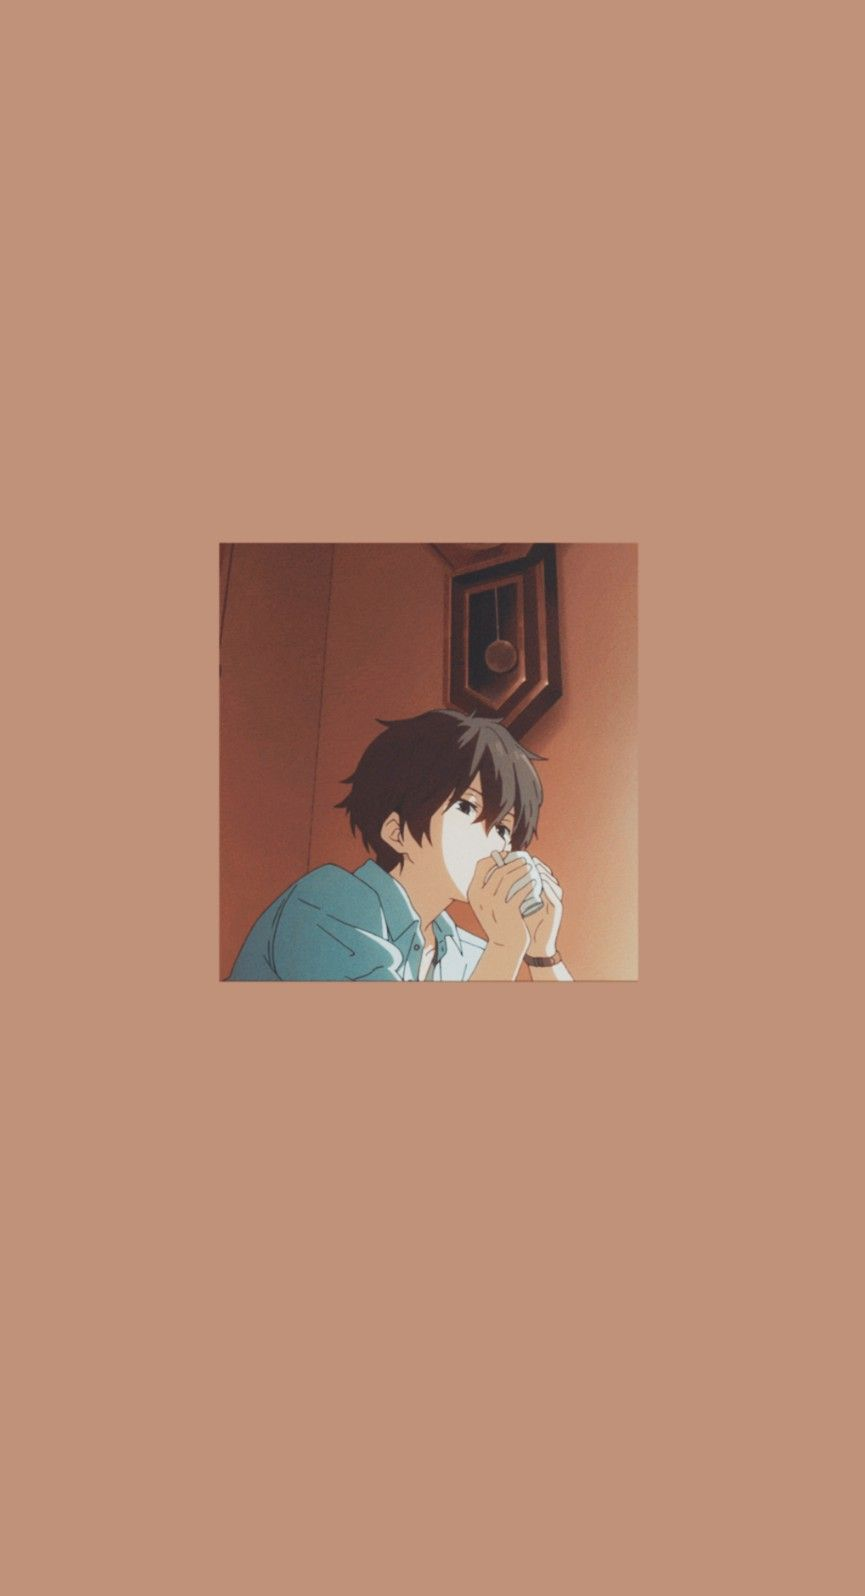 Anime Hyouka Wallpaper Seni Anime Gambar Karakter Seni Animasi Anime simple boy wallpaper